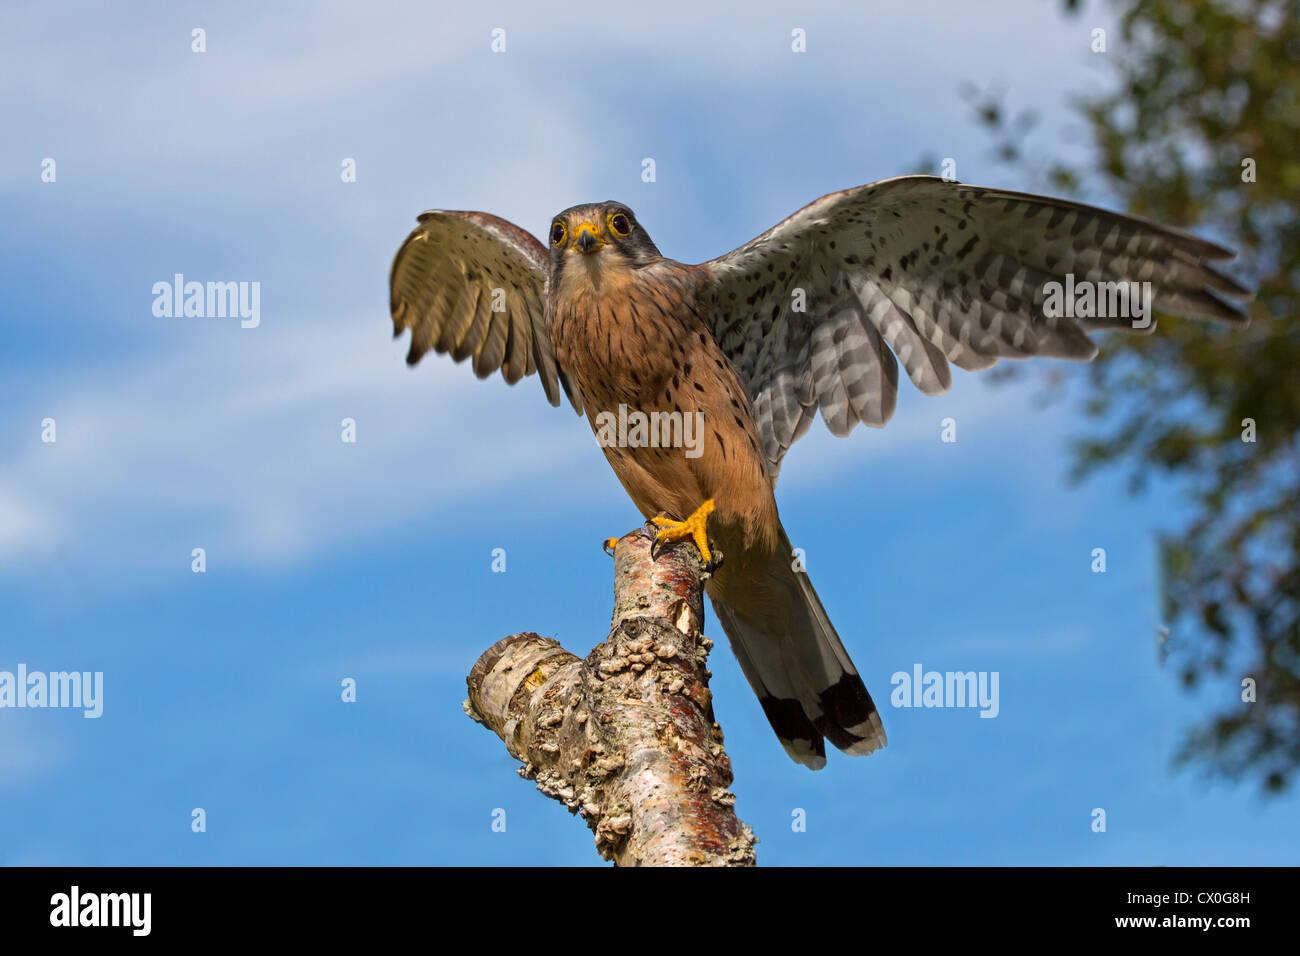 Male Kestrel - Stock Image